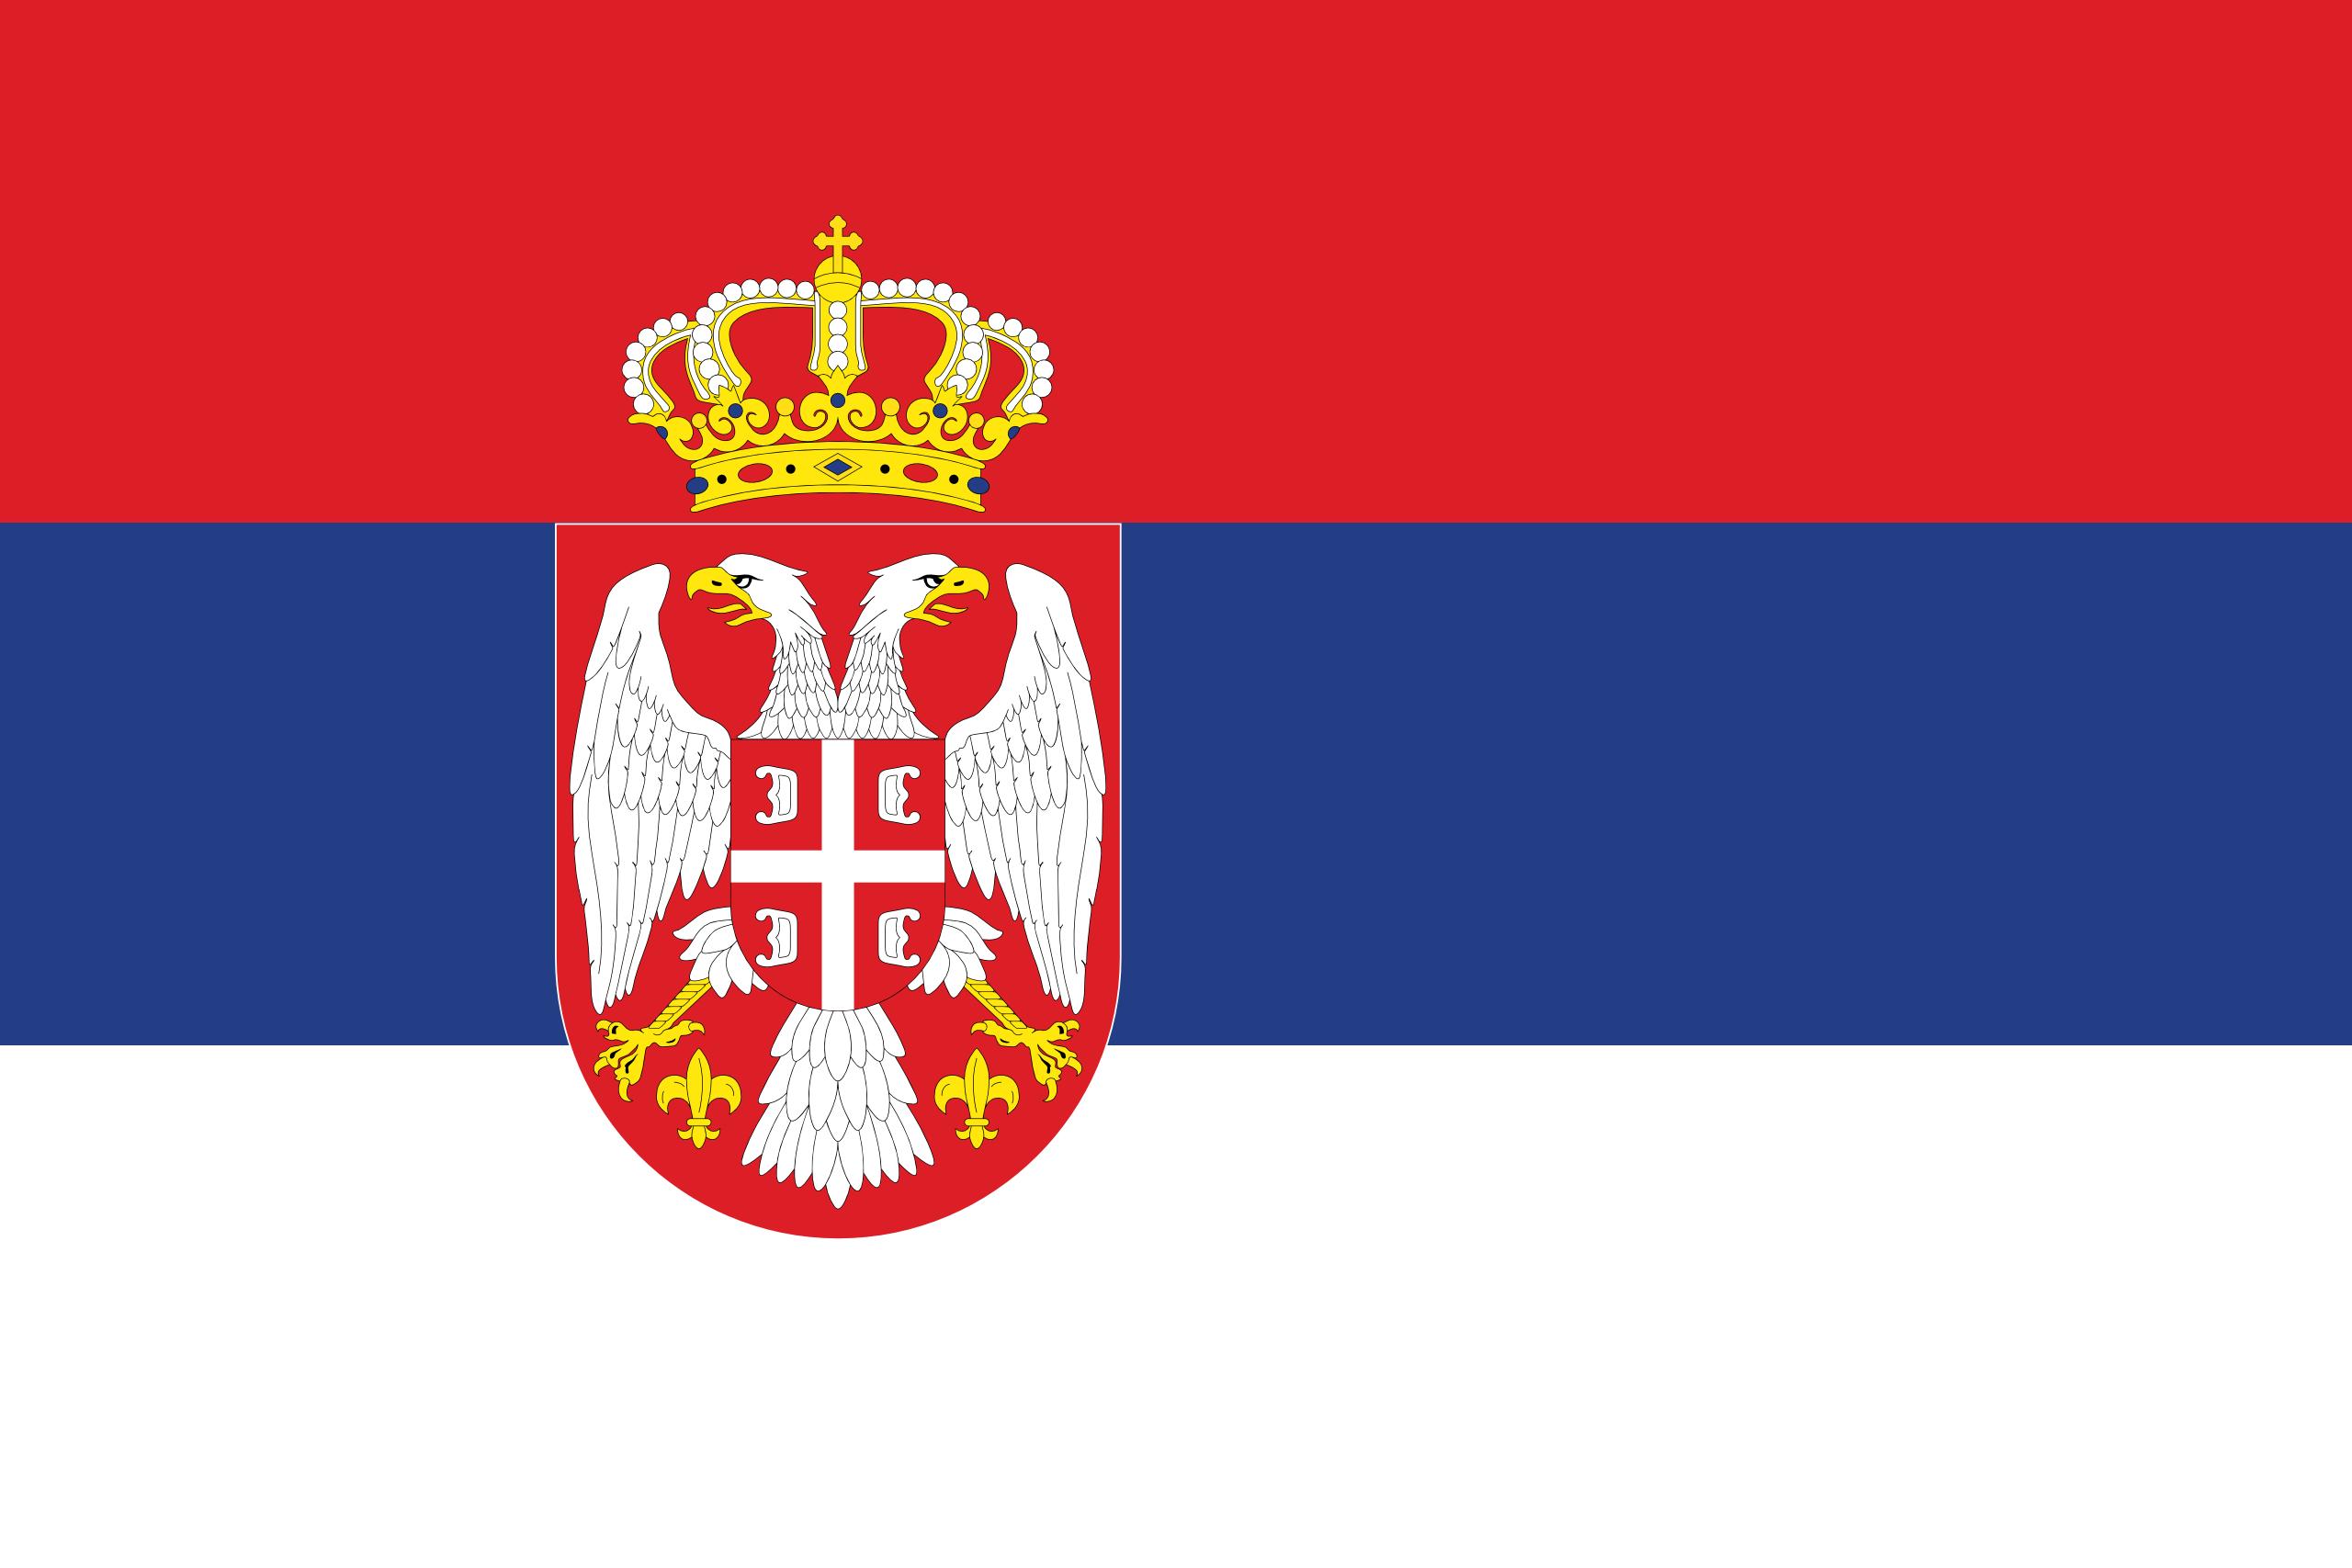 Serbie, pays, emblème, logo, symbole - Fonds d'écran HD - Professor-falken.com